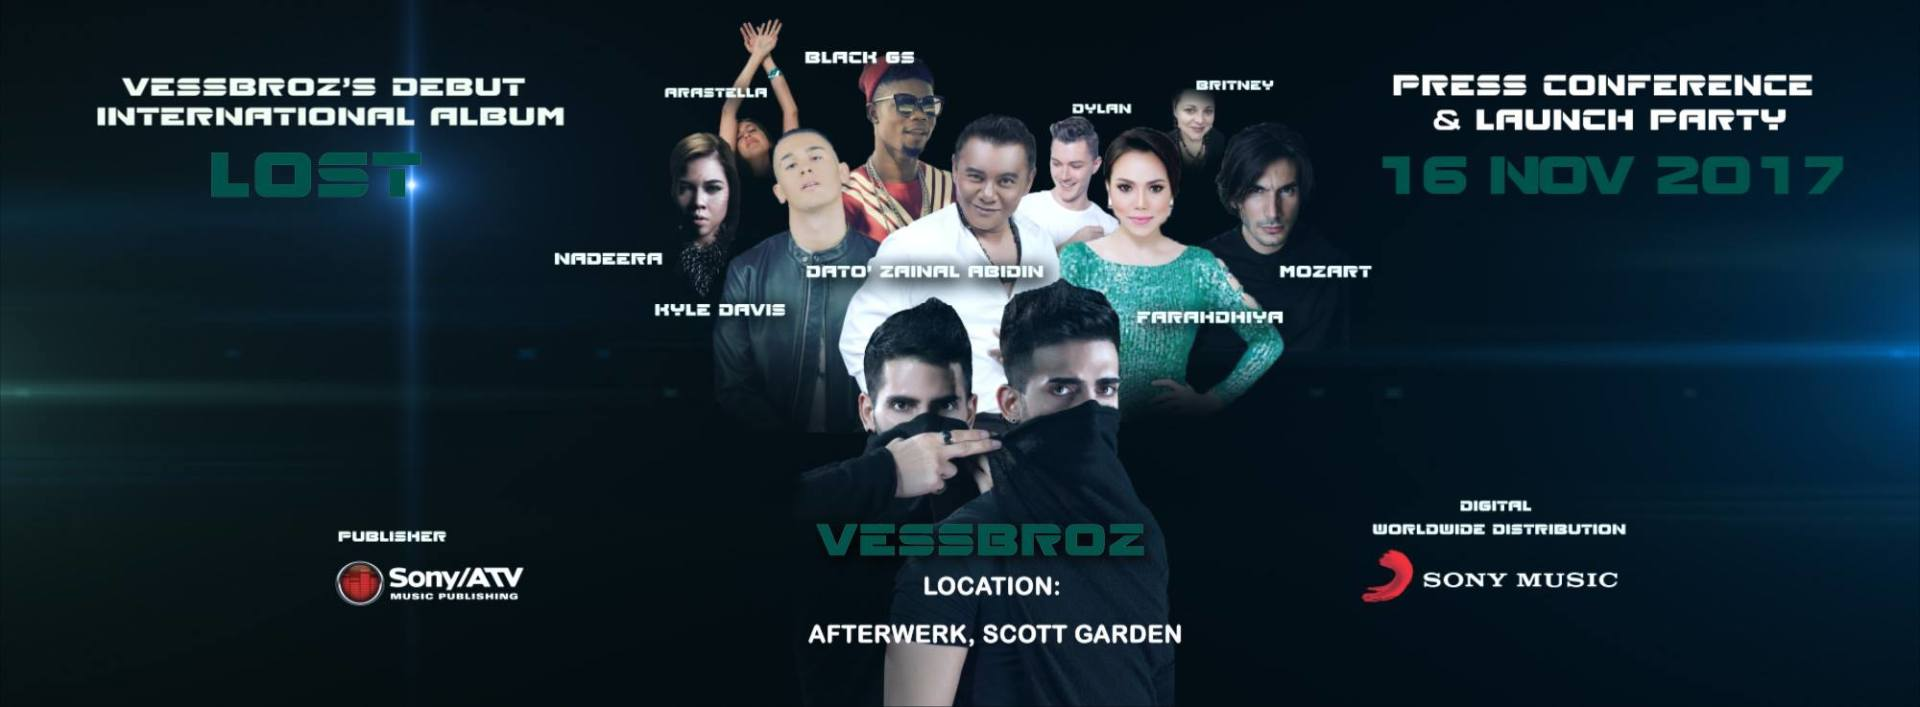 Vessbroz's Debut International Album Launch